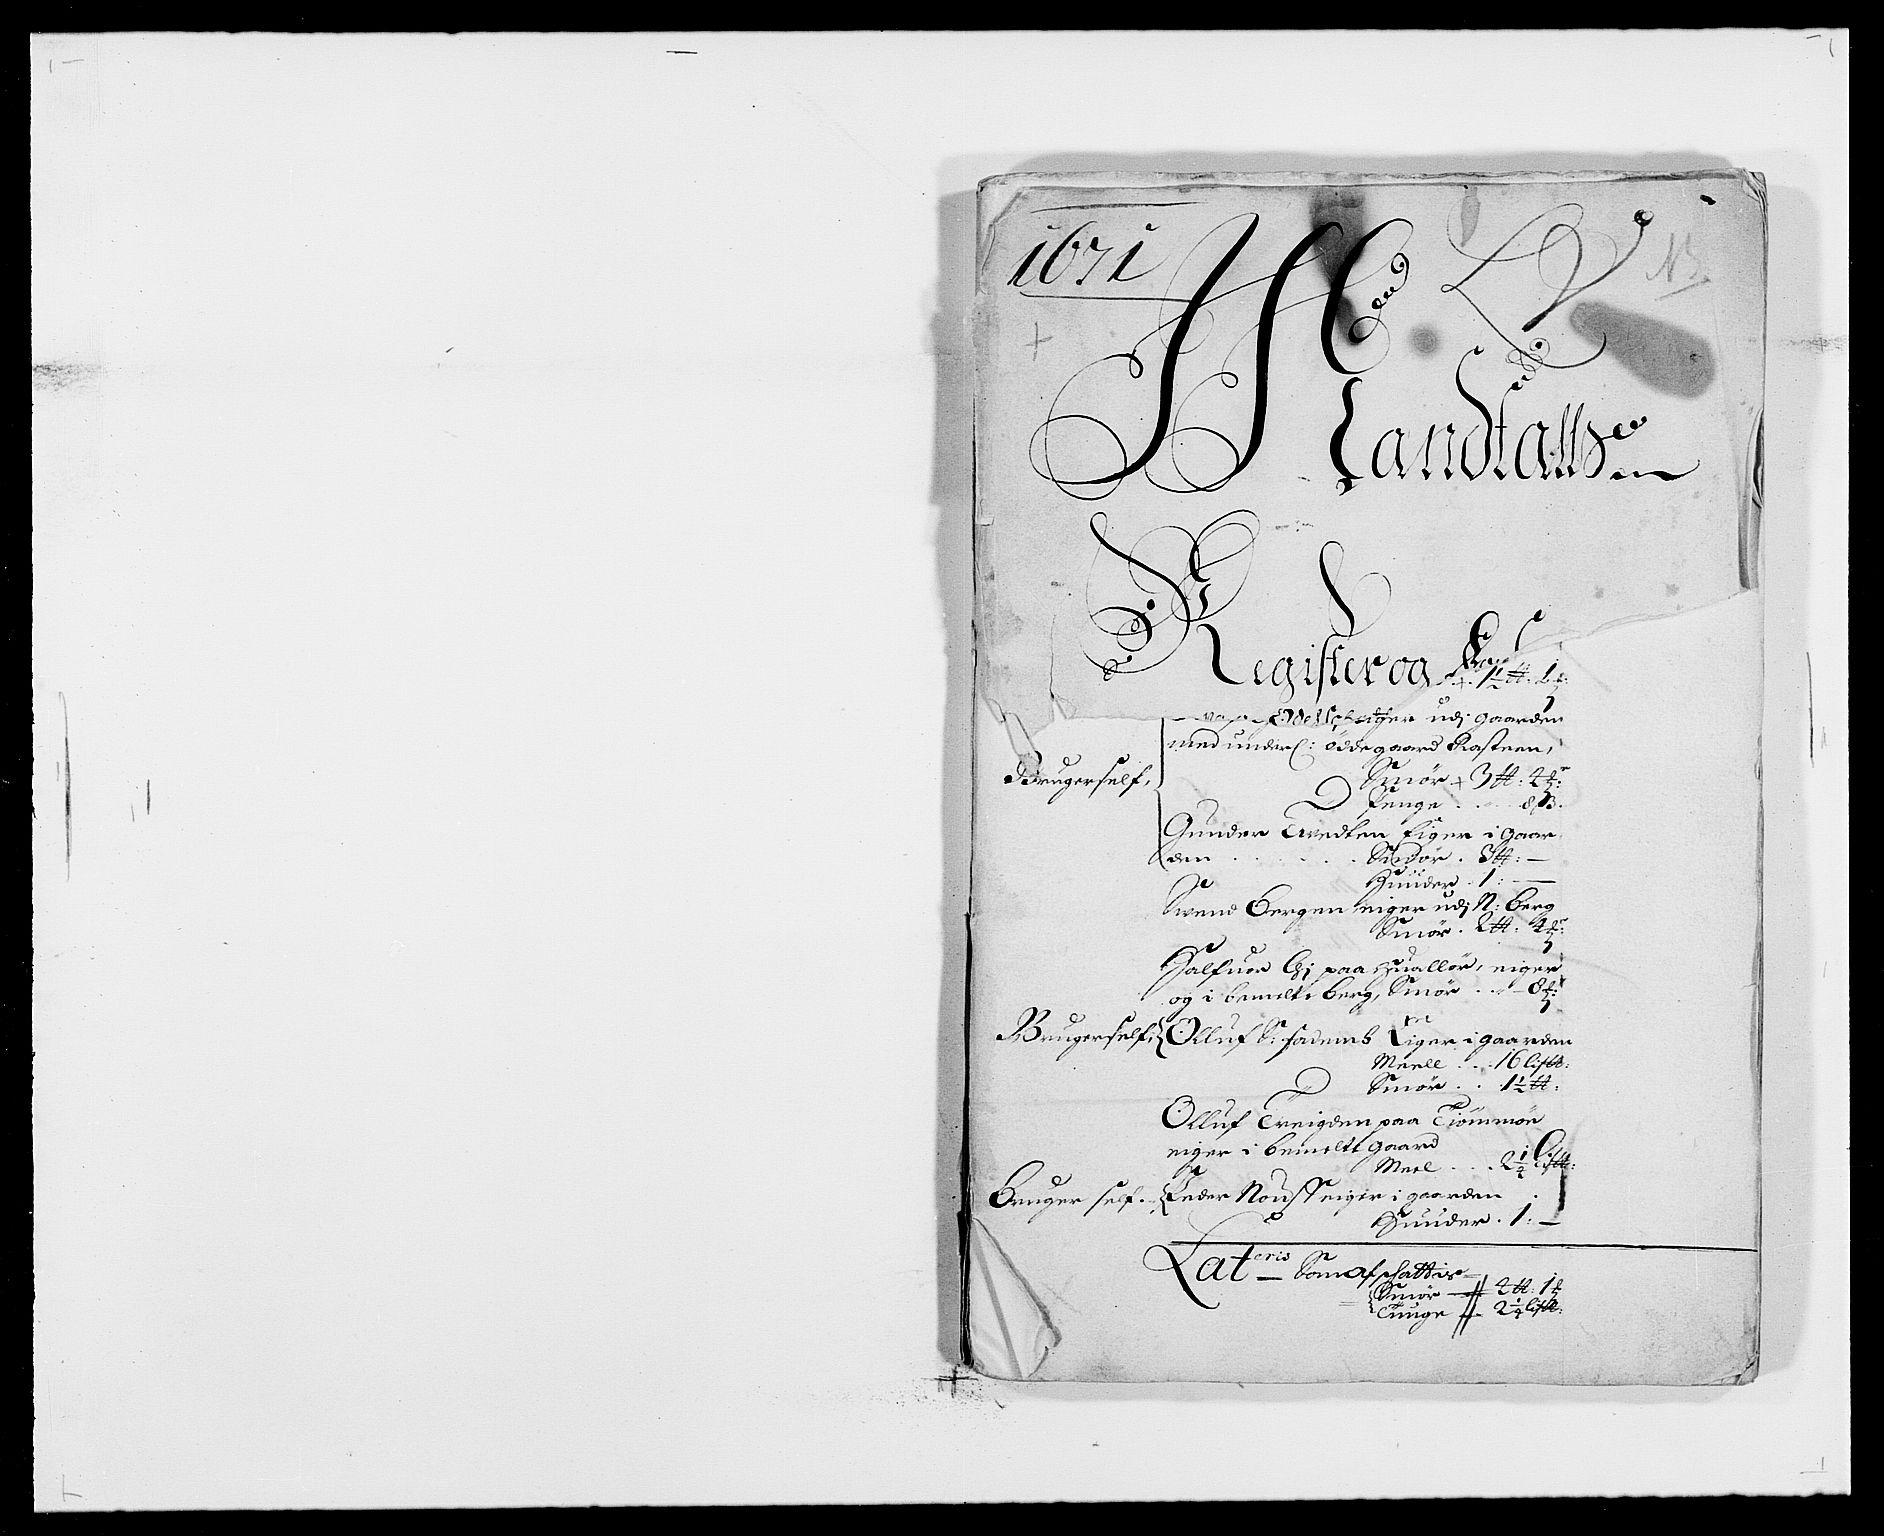 RA, Rentekammeret inntil 1814, Reviderte regnskaper, Fogderegnskap, R32/L1841: Fogderegnskap Jarlsberg grevskap, 1664-1673, s. 155